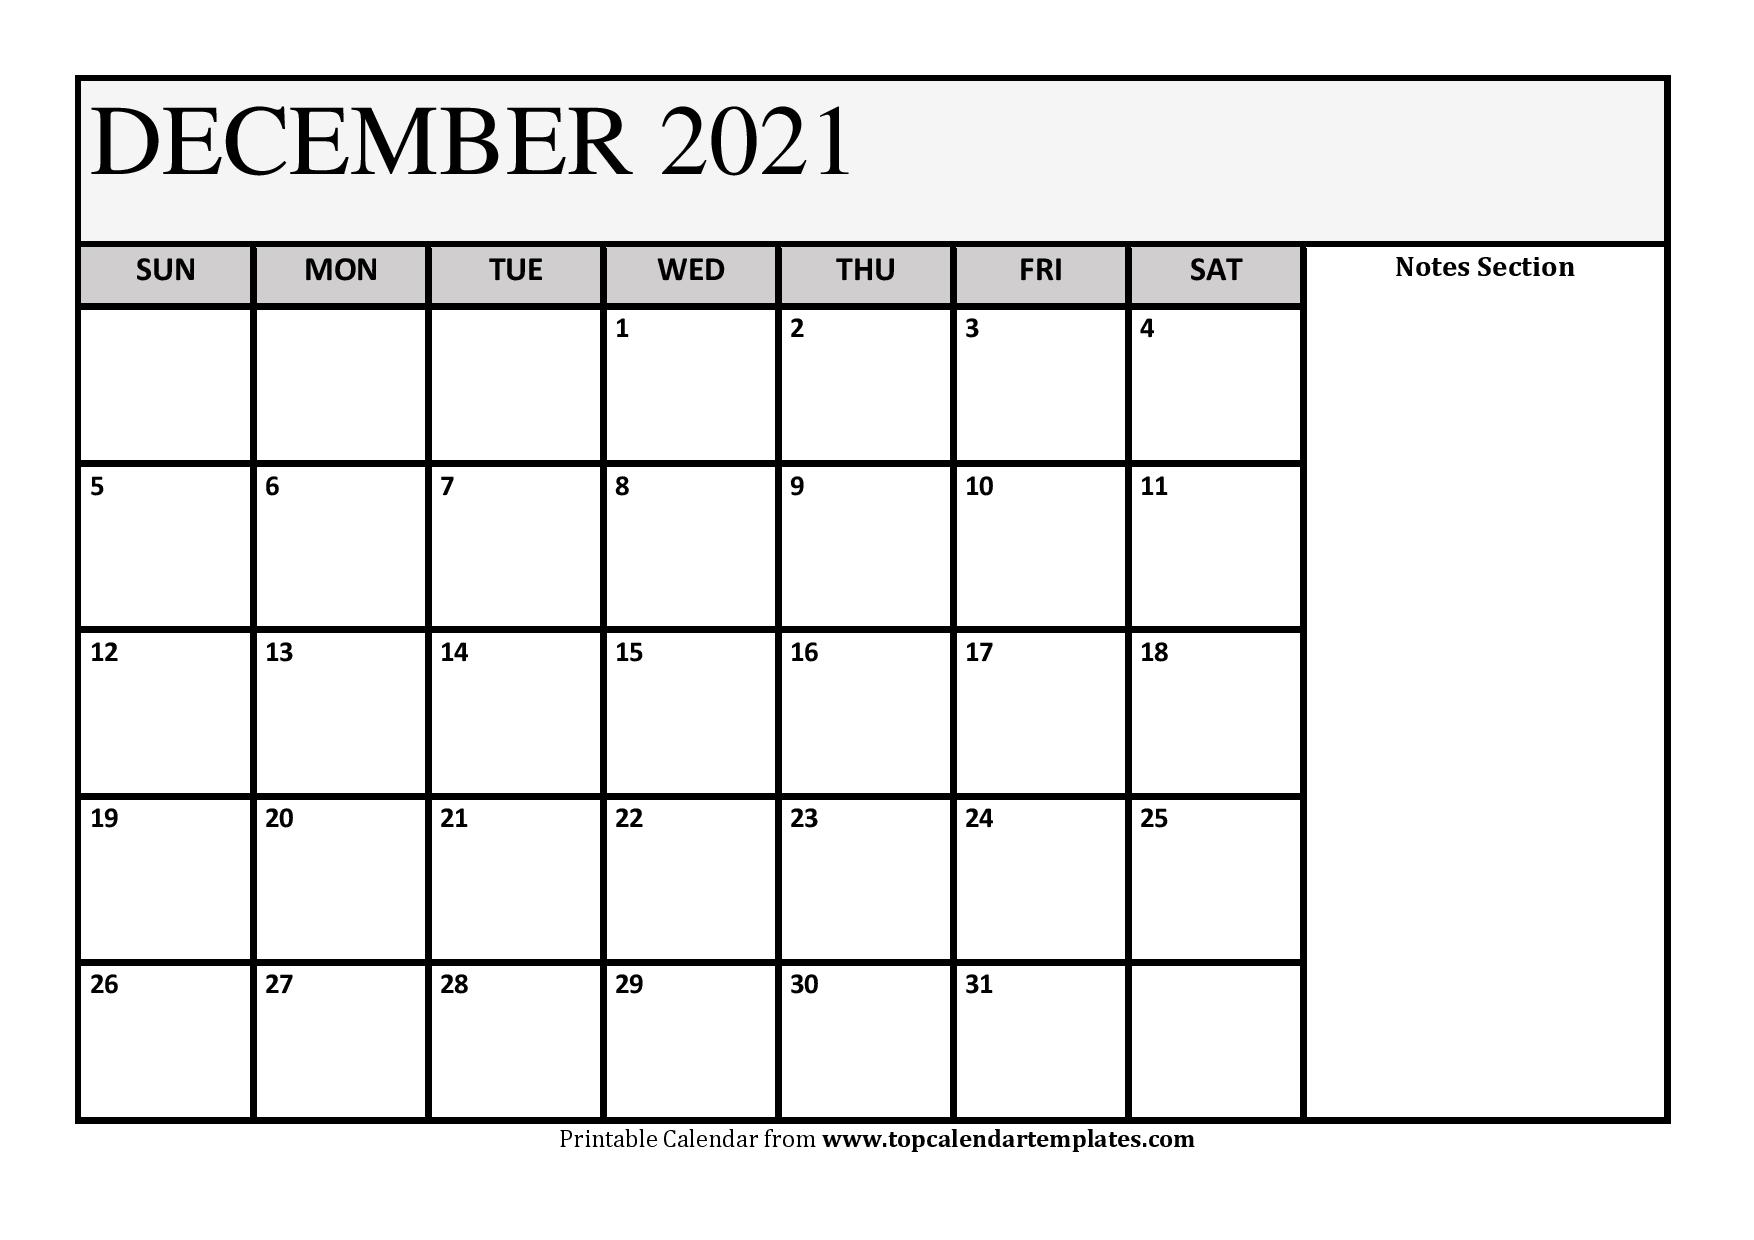 December 2021 Printable Calendar - Monthly Templates